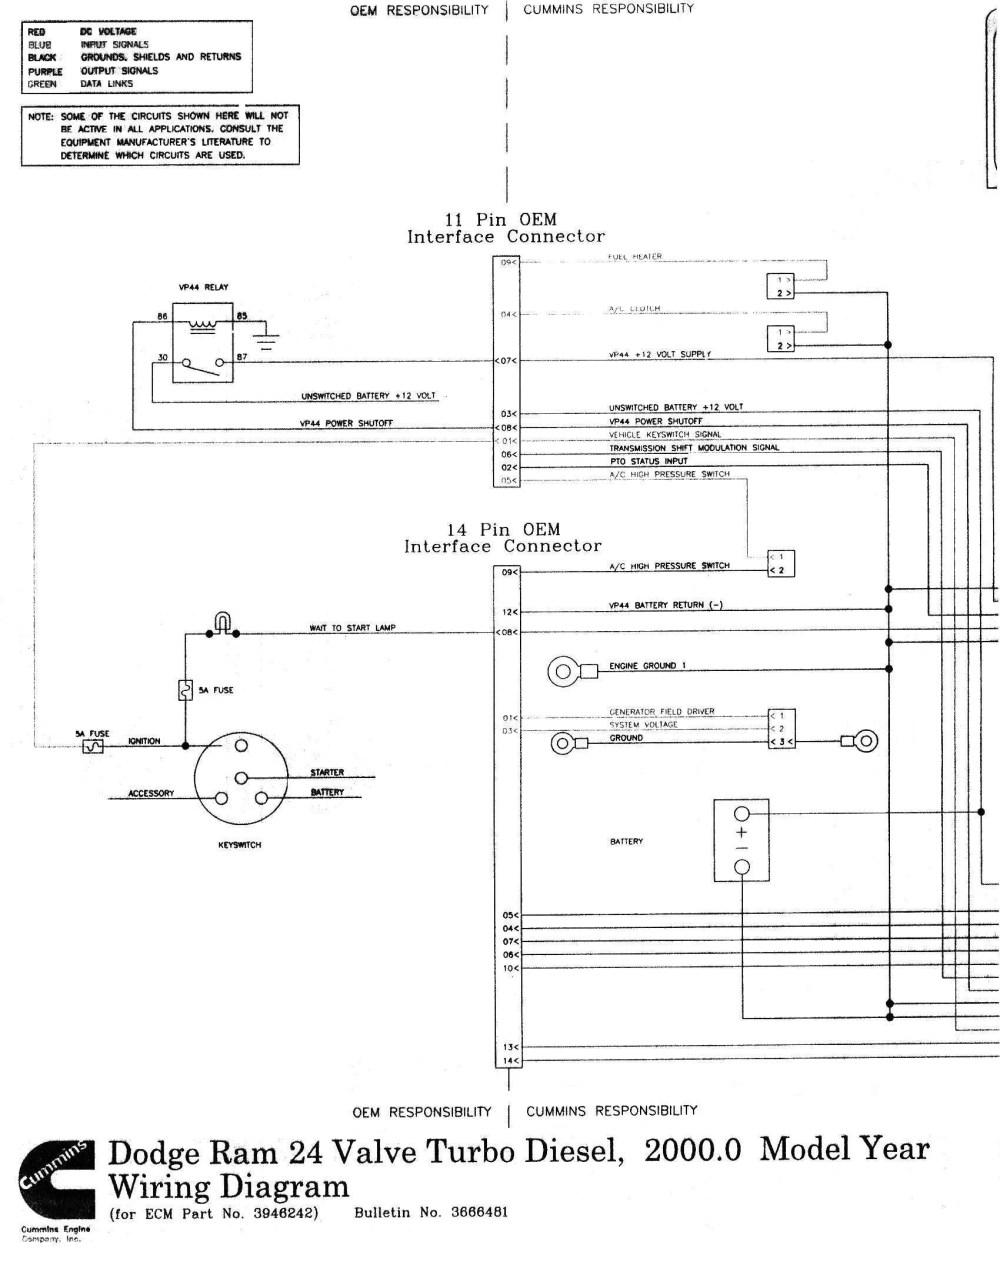 medium resolution of 2002 dodge ram 1500 parts diagram wiring diagram 2007 dodge ram 1500 best ecm details for